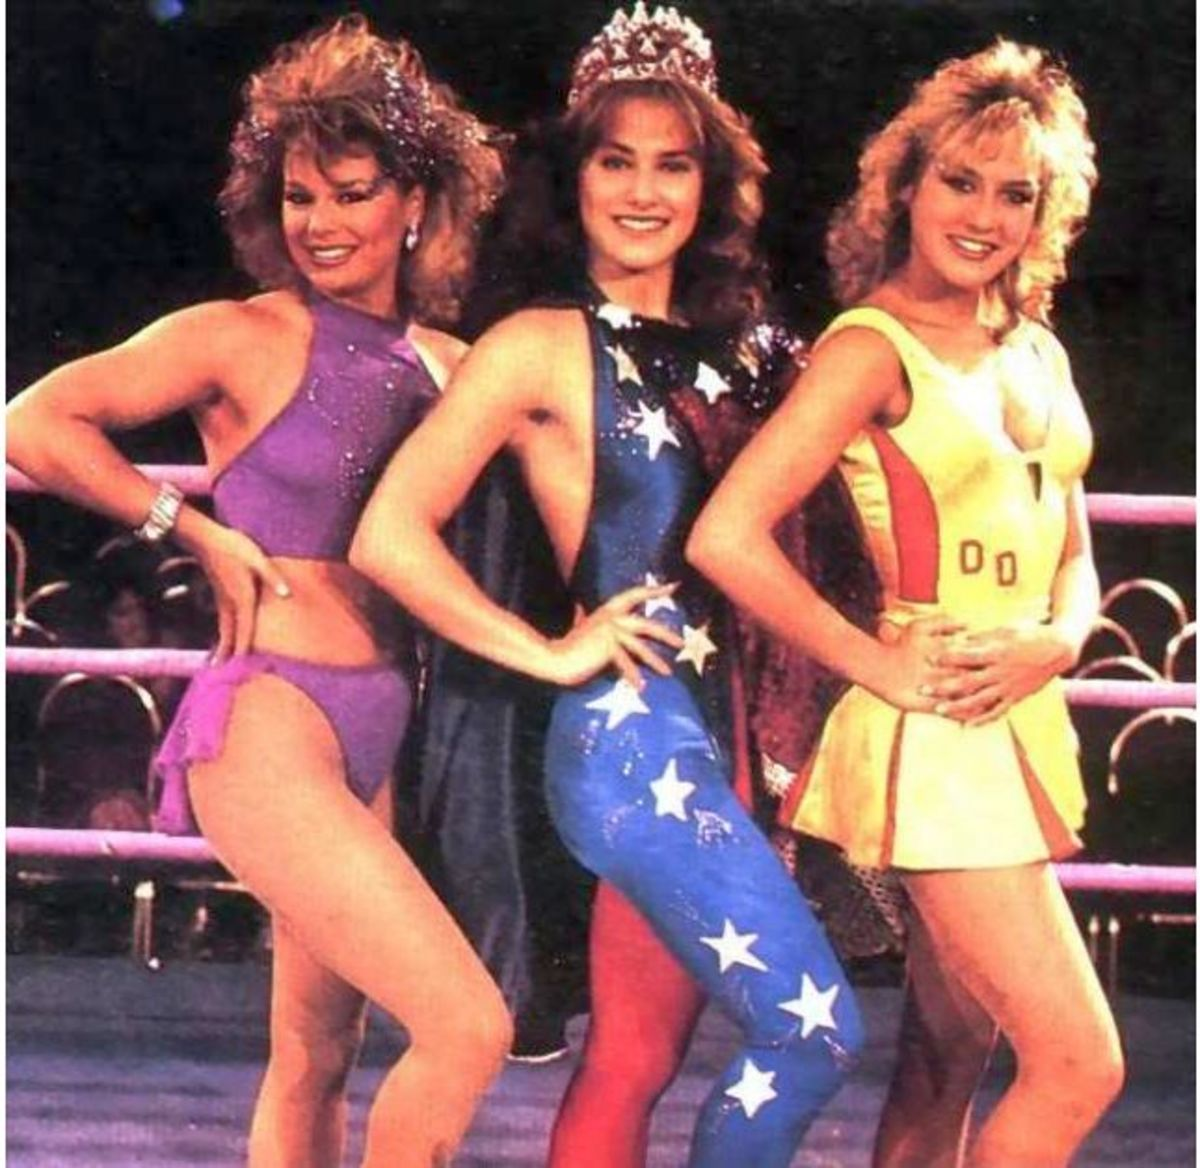 Tina Ferrari, Americana and Debbie Debutante